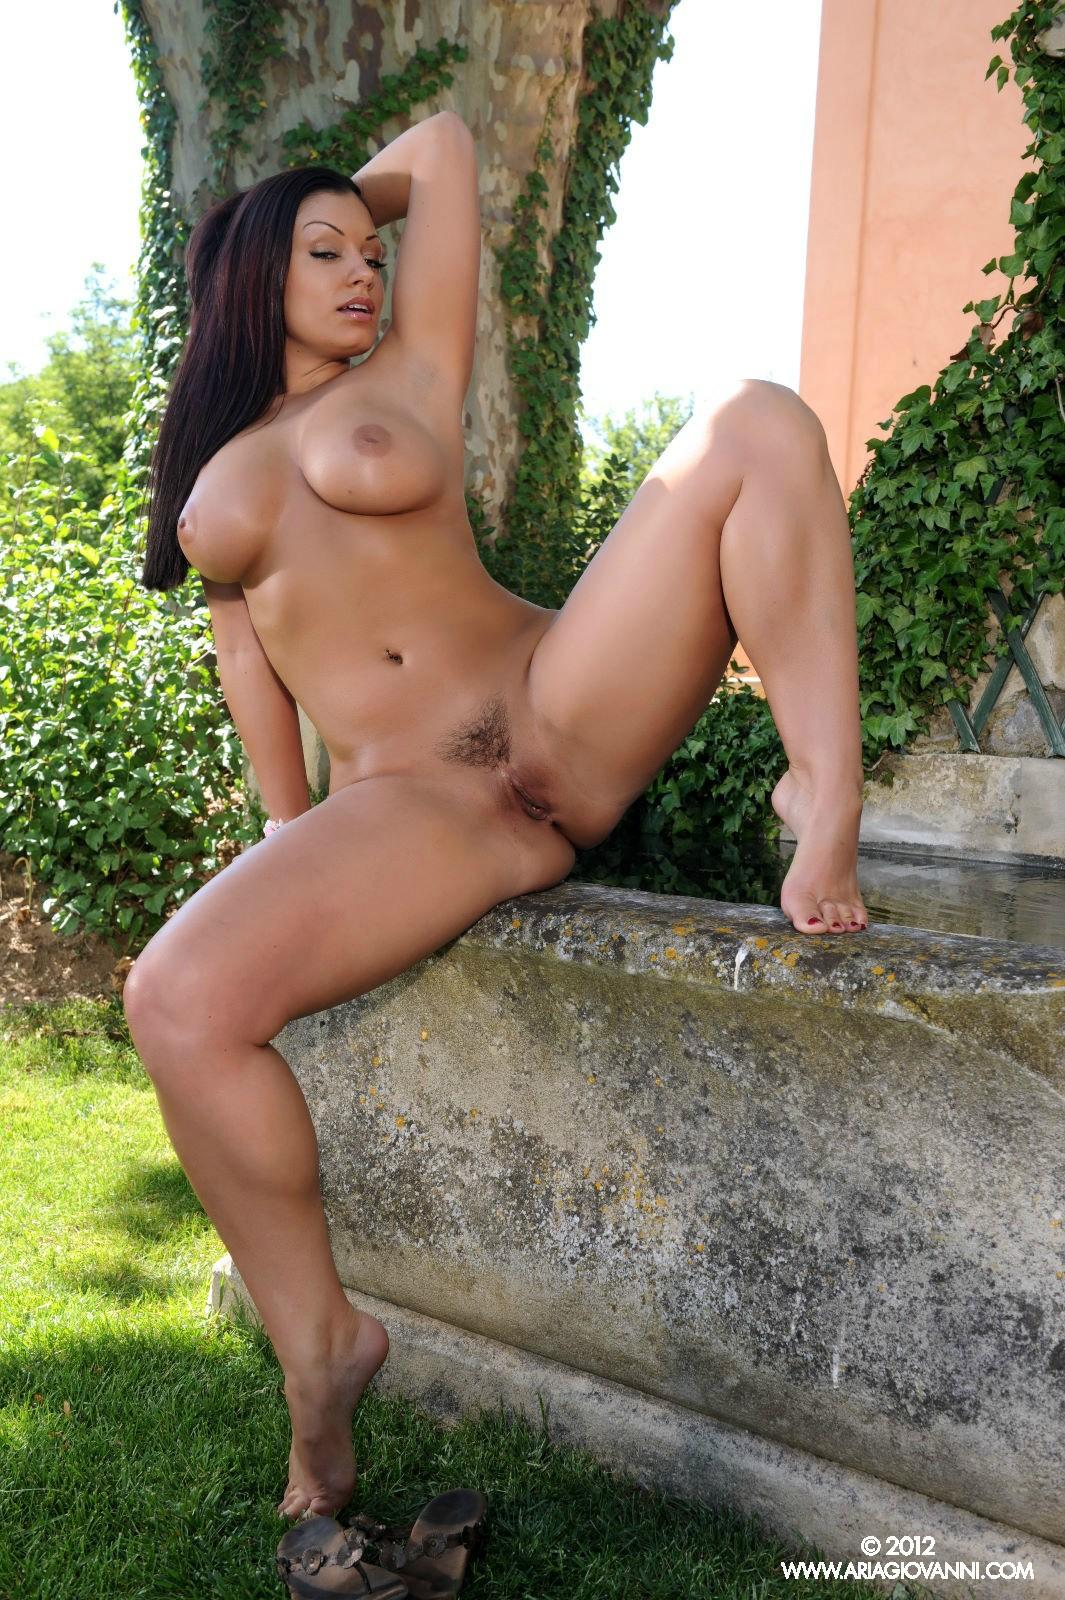 Superstar Aria Giovanni Nude Pics Photos